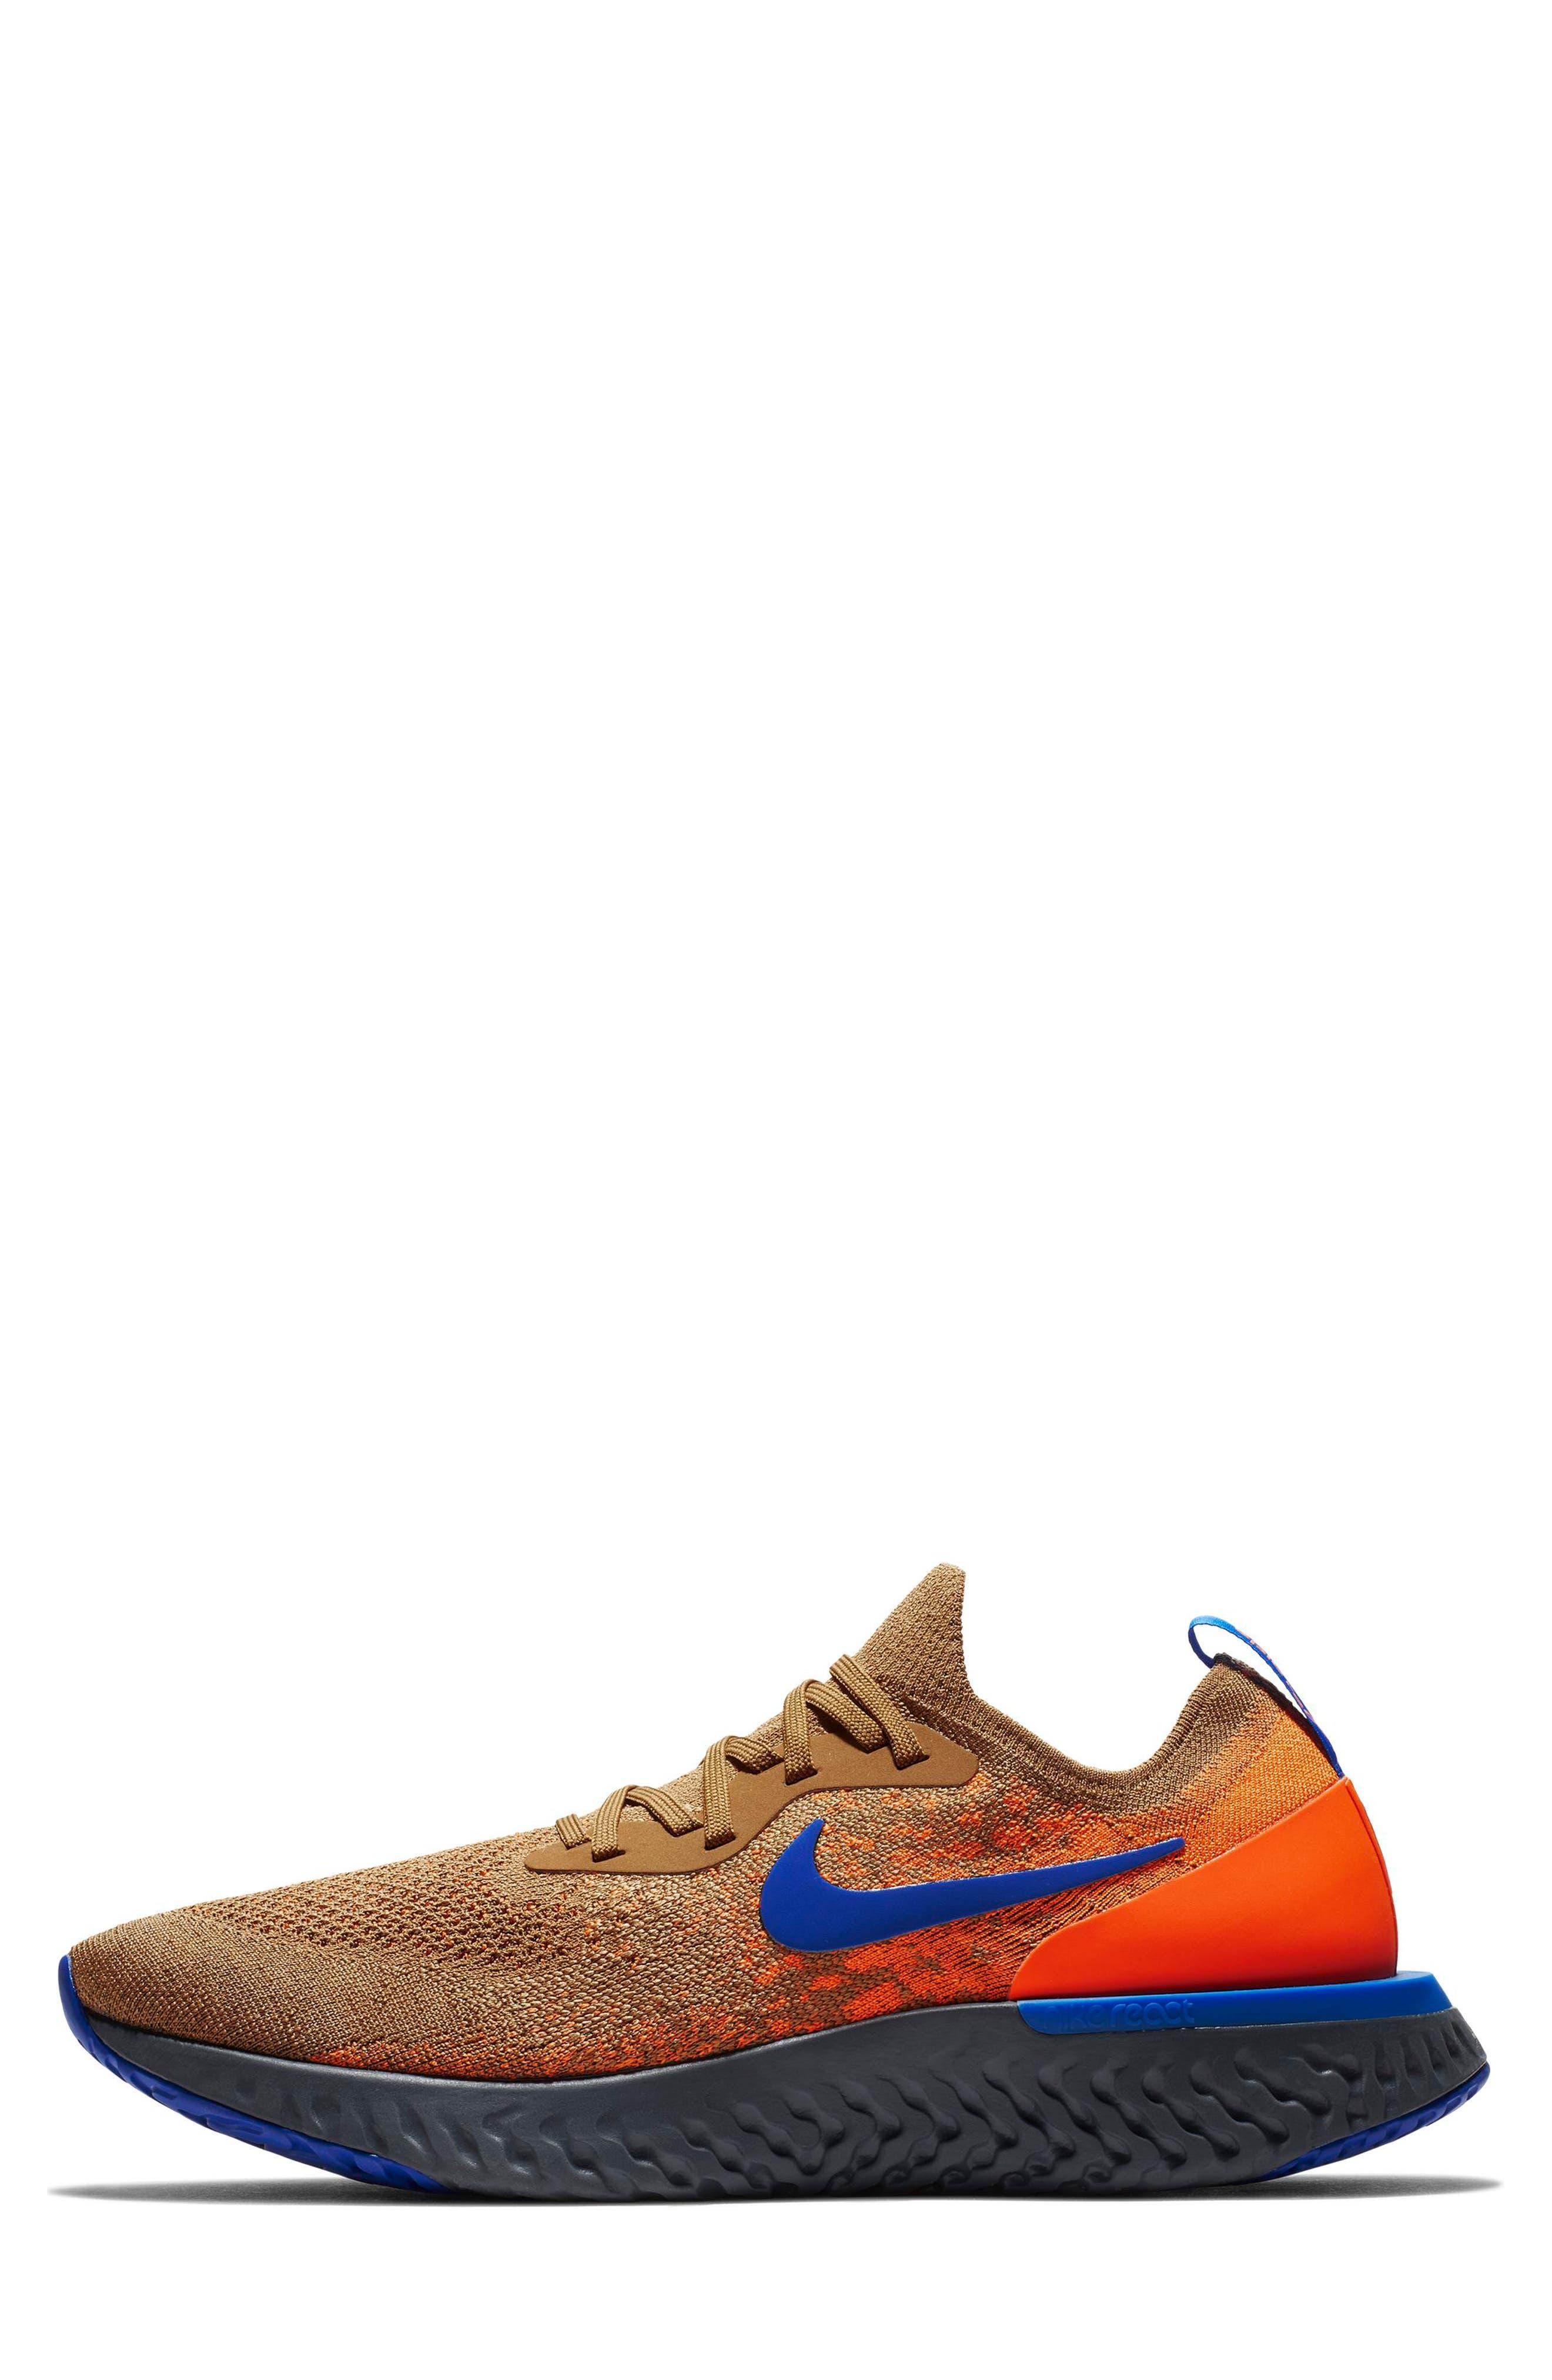 Epic React Flyknit Running Shoe,                             Alternate thumbnail 7, color,                             GOLDEN BEIGE/ BLUE/ ORANGE